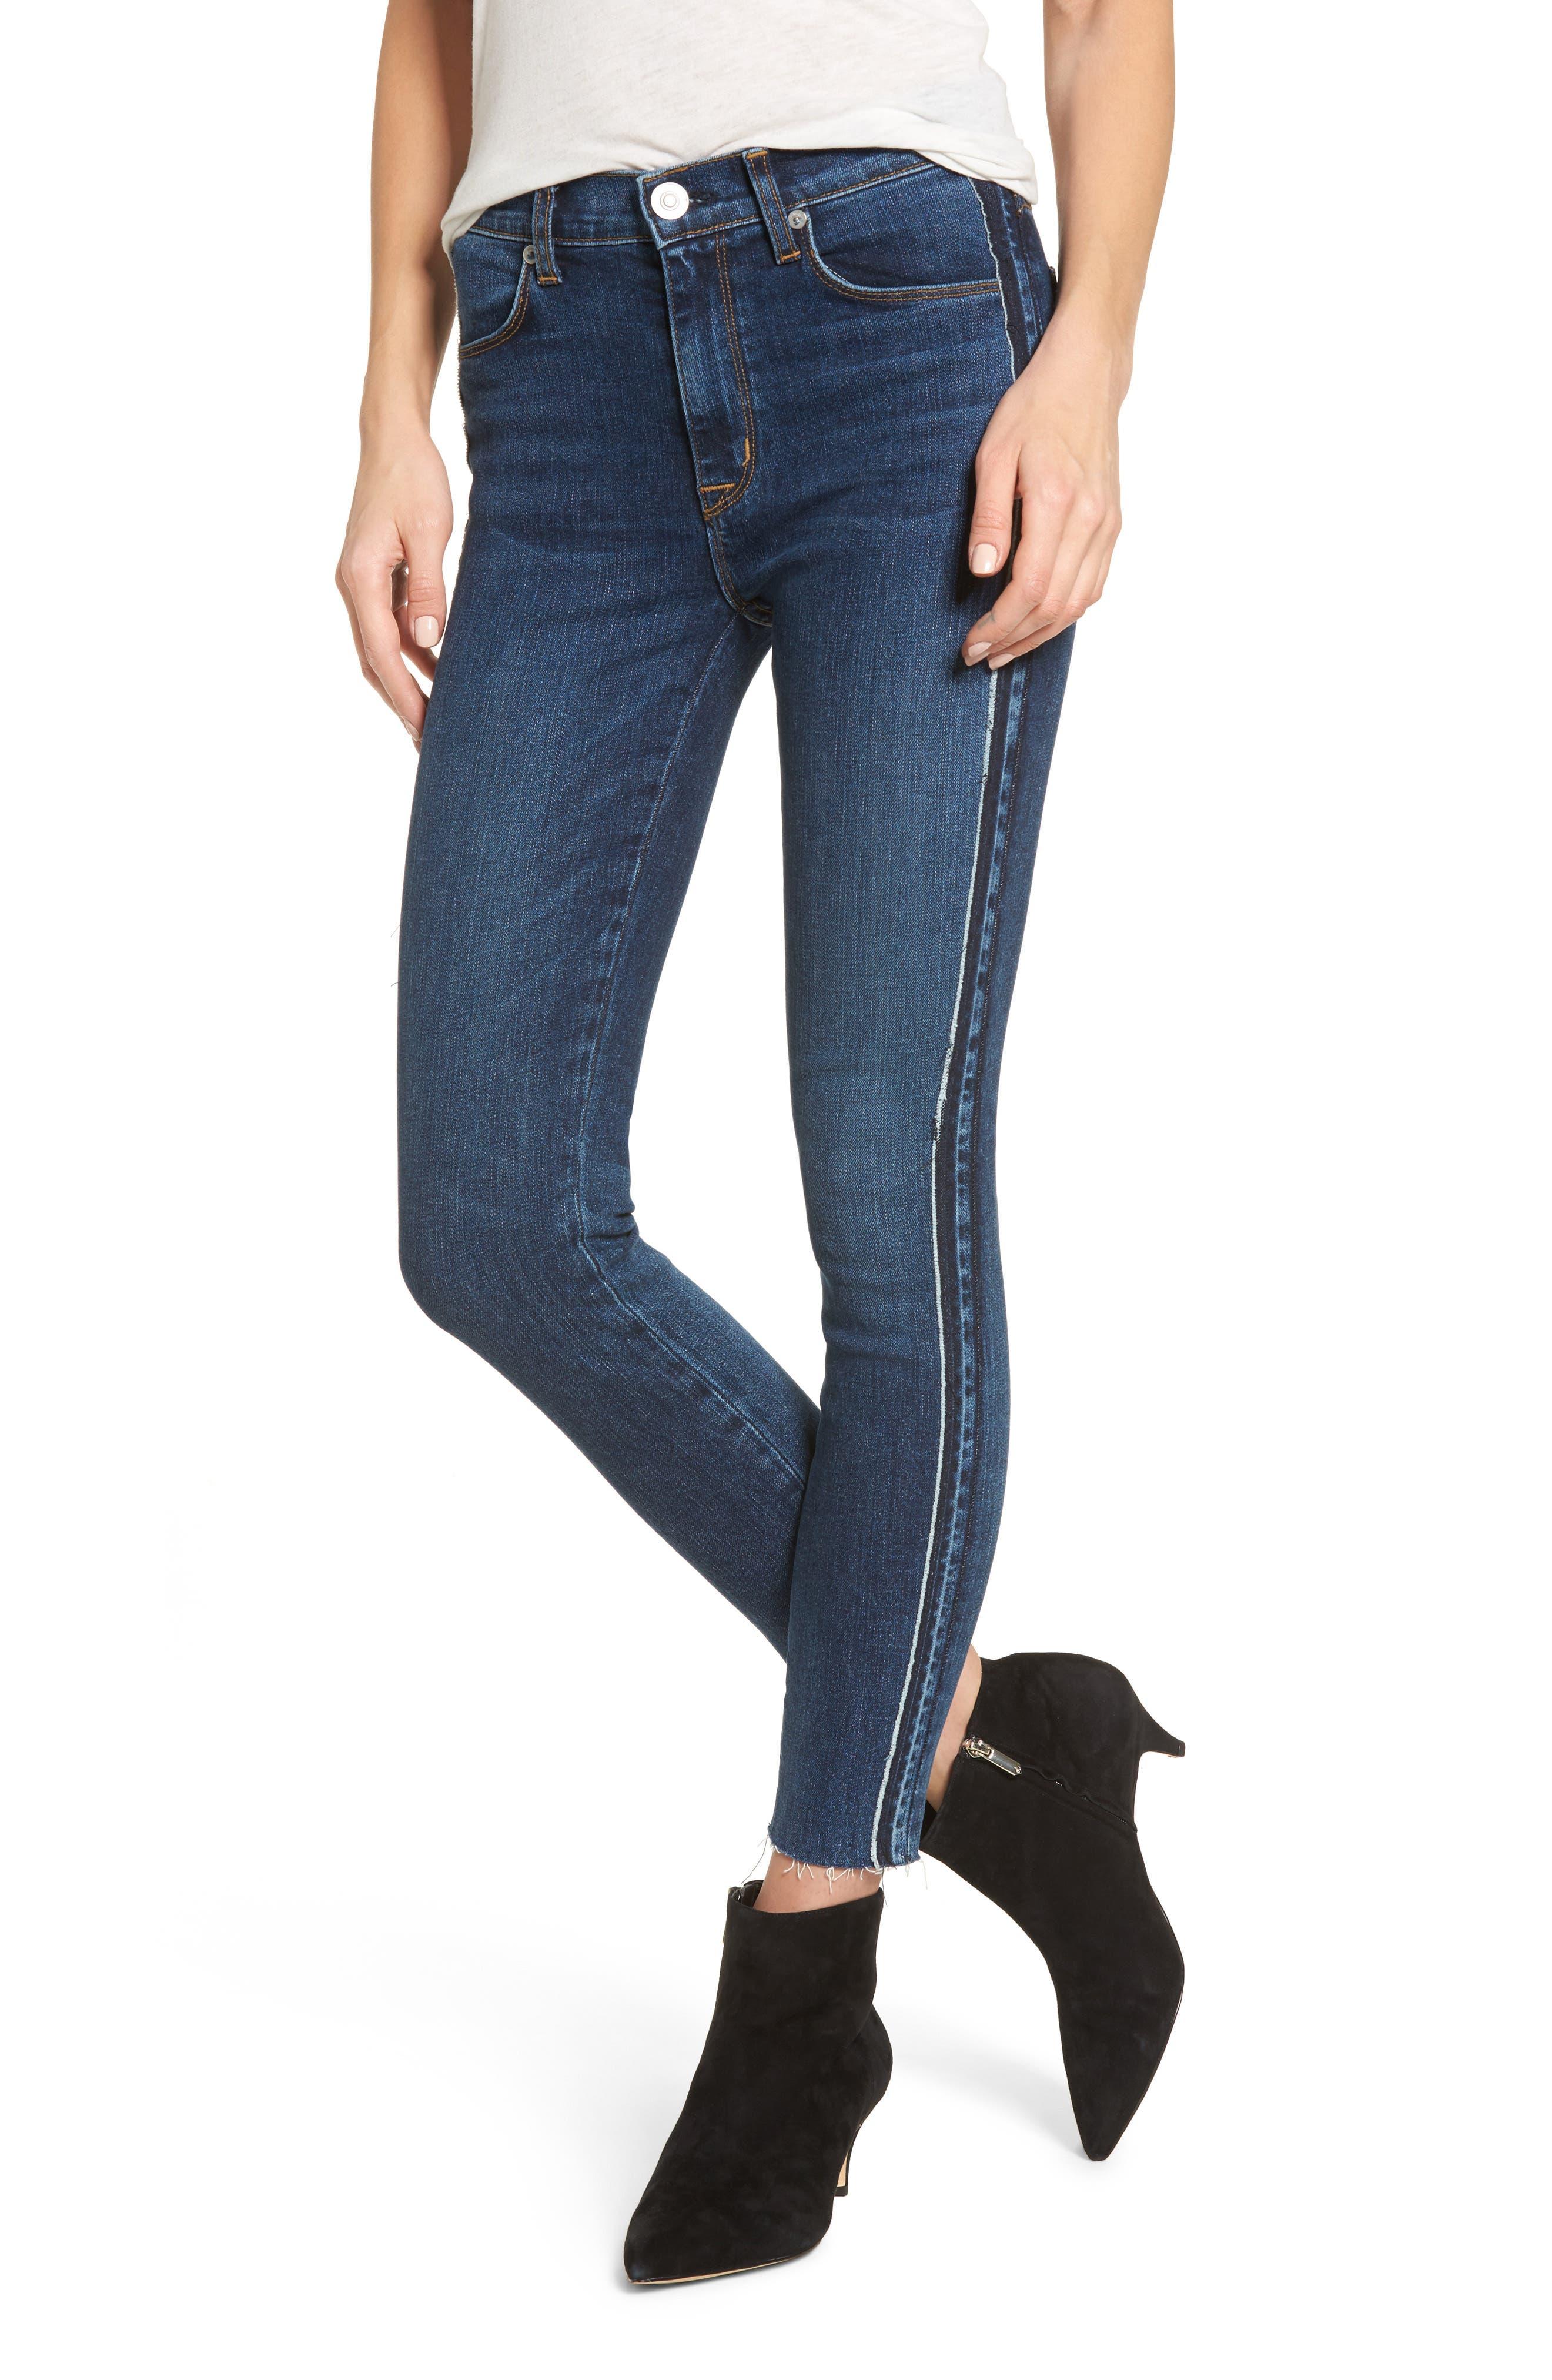 Barbara High Waist Super Skinny Jeans,                             Main thumbnail 1, color,                             400